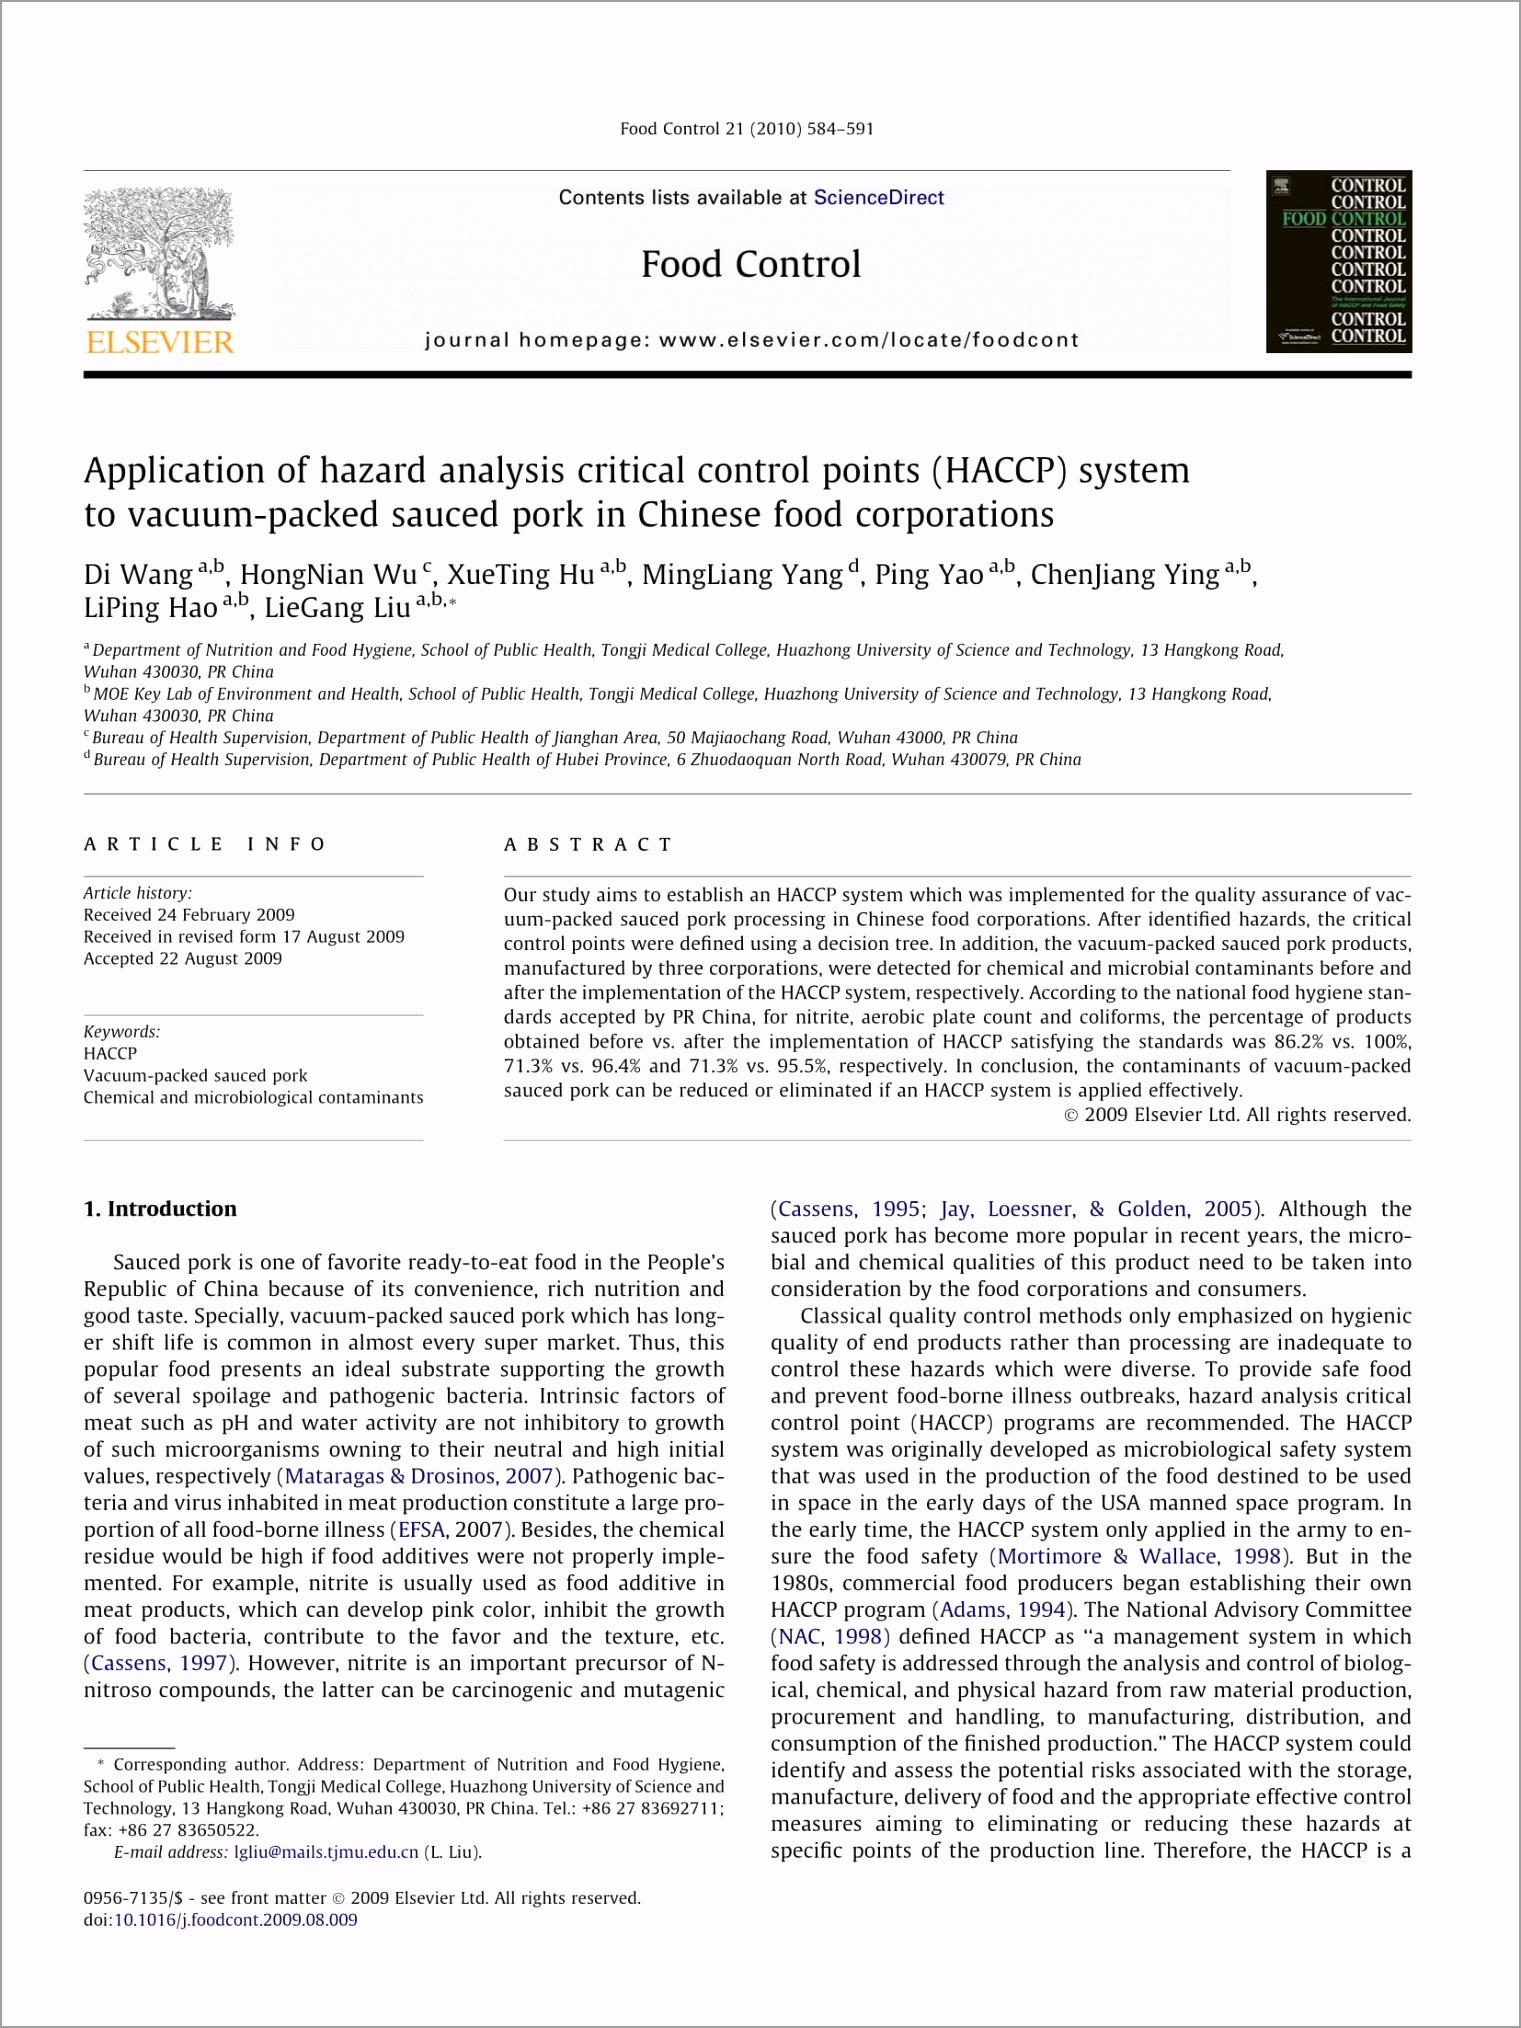 HACCP Hazard Analysis and Application Guide Example 1 aixor